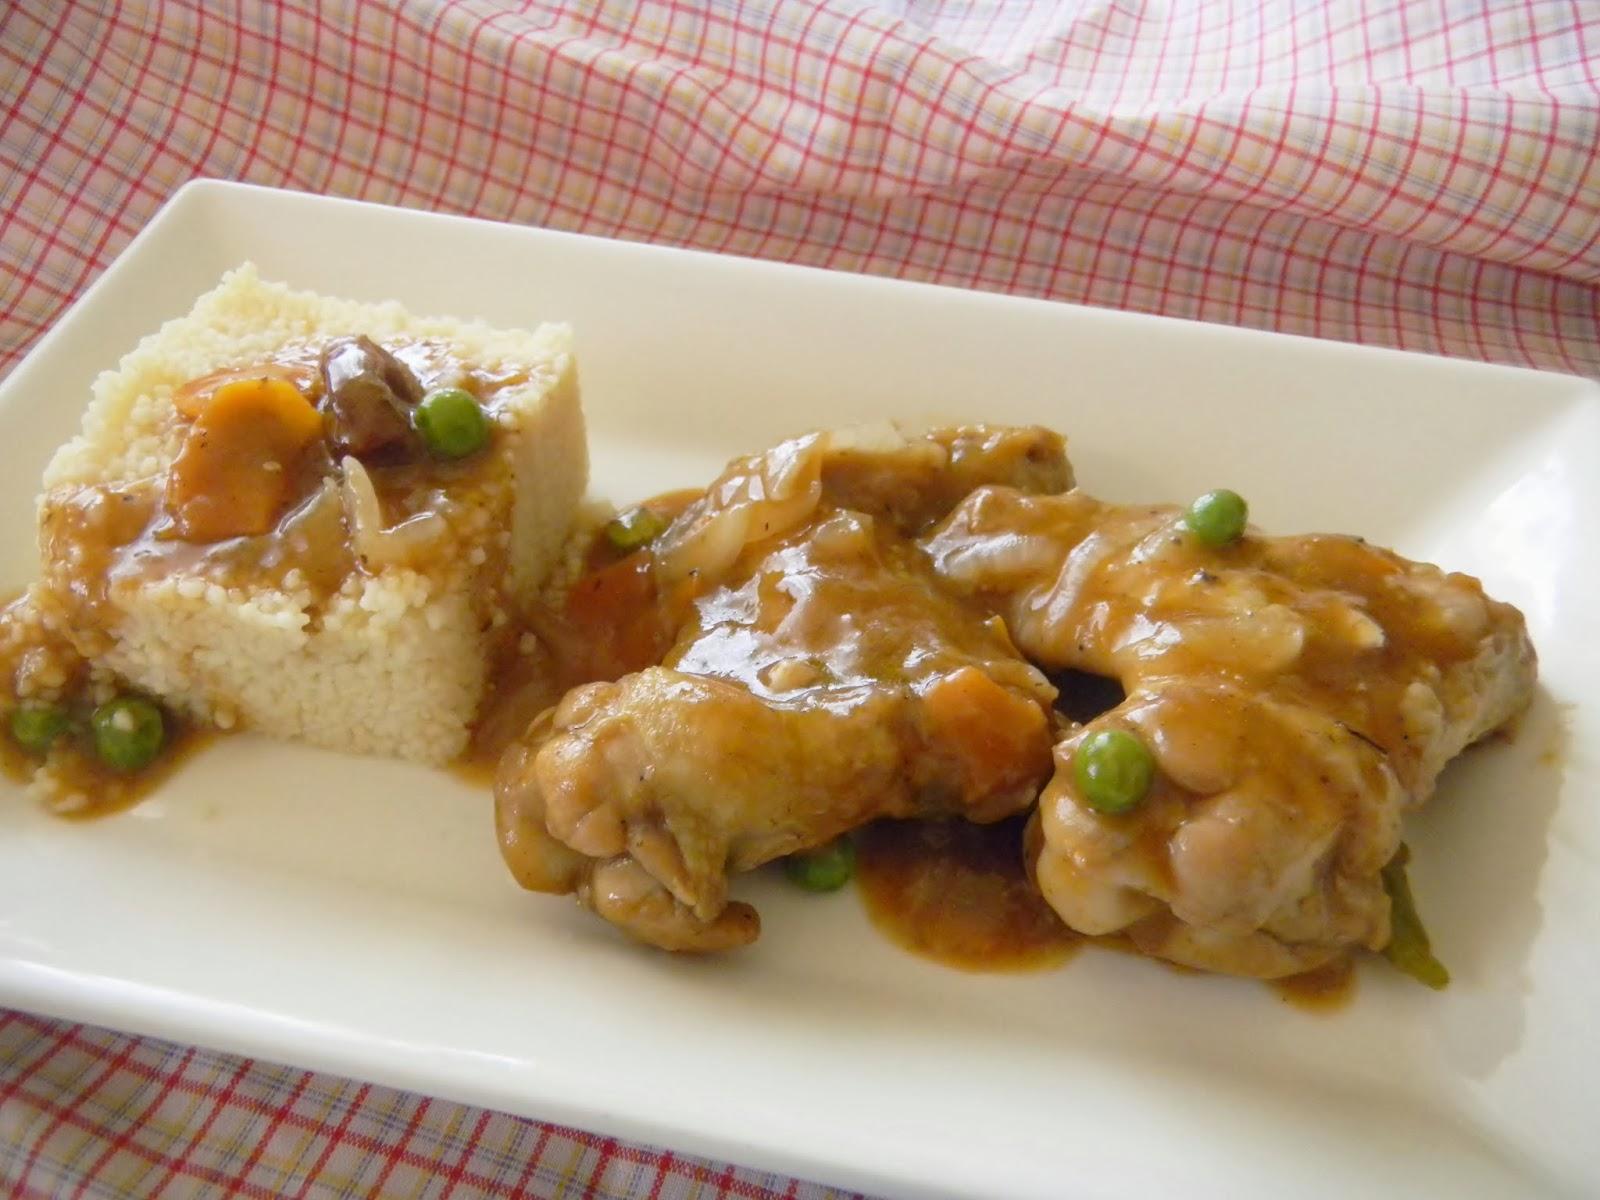 http://cuinasensemaldecap.blogspot.com.es/2012/08/pollastre-rostit-amb-verdures.html